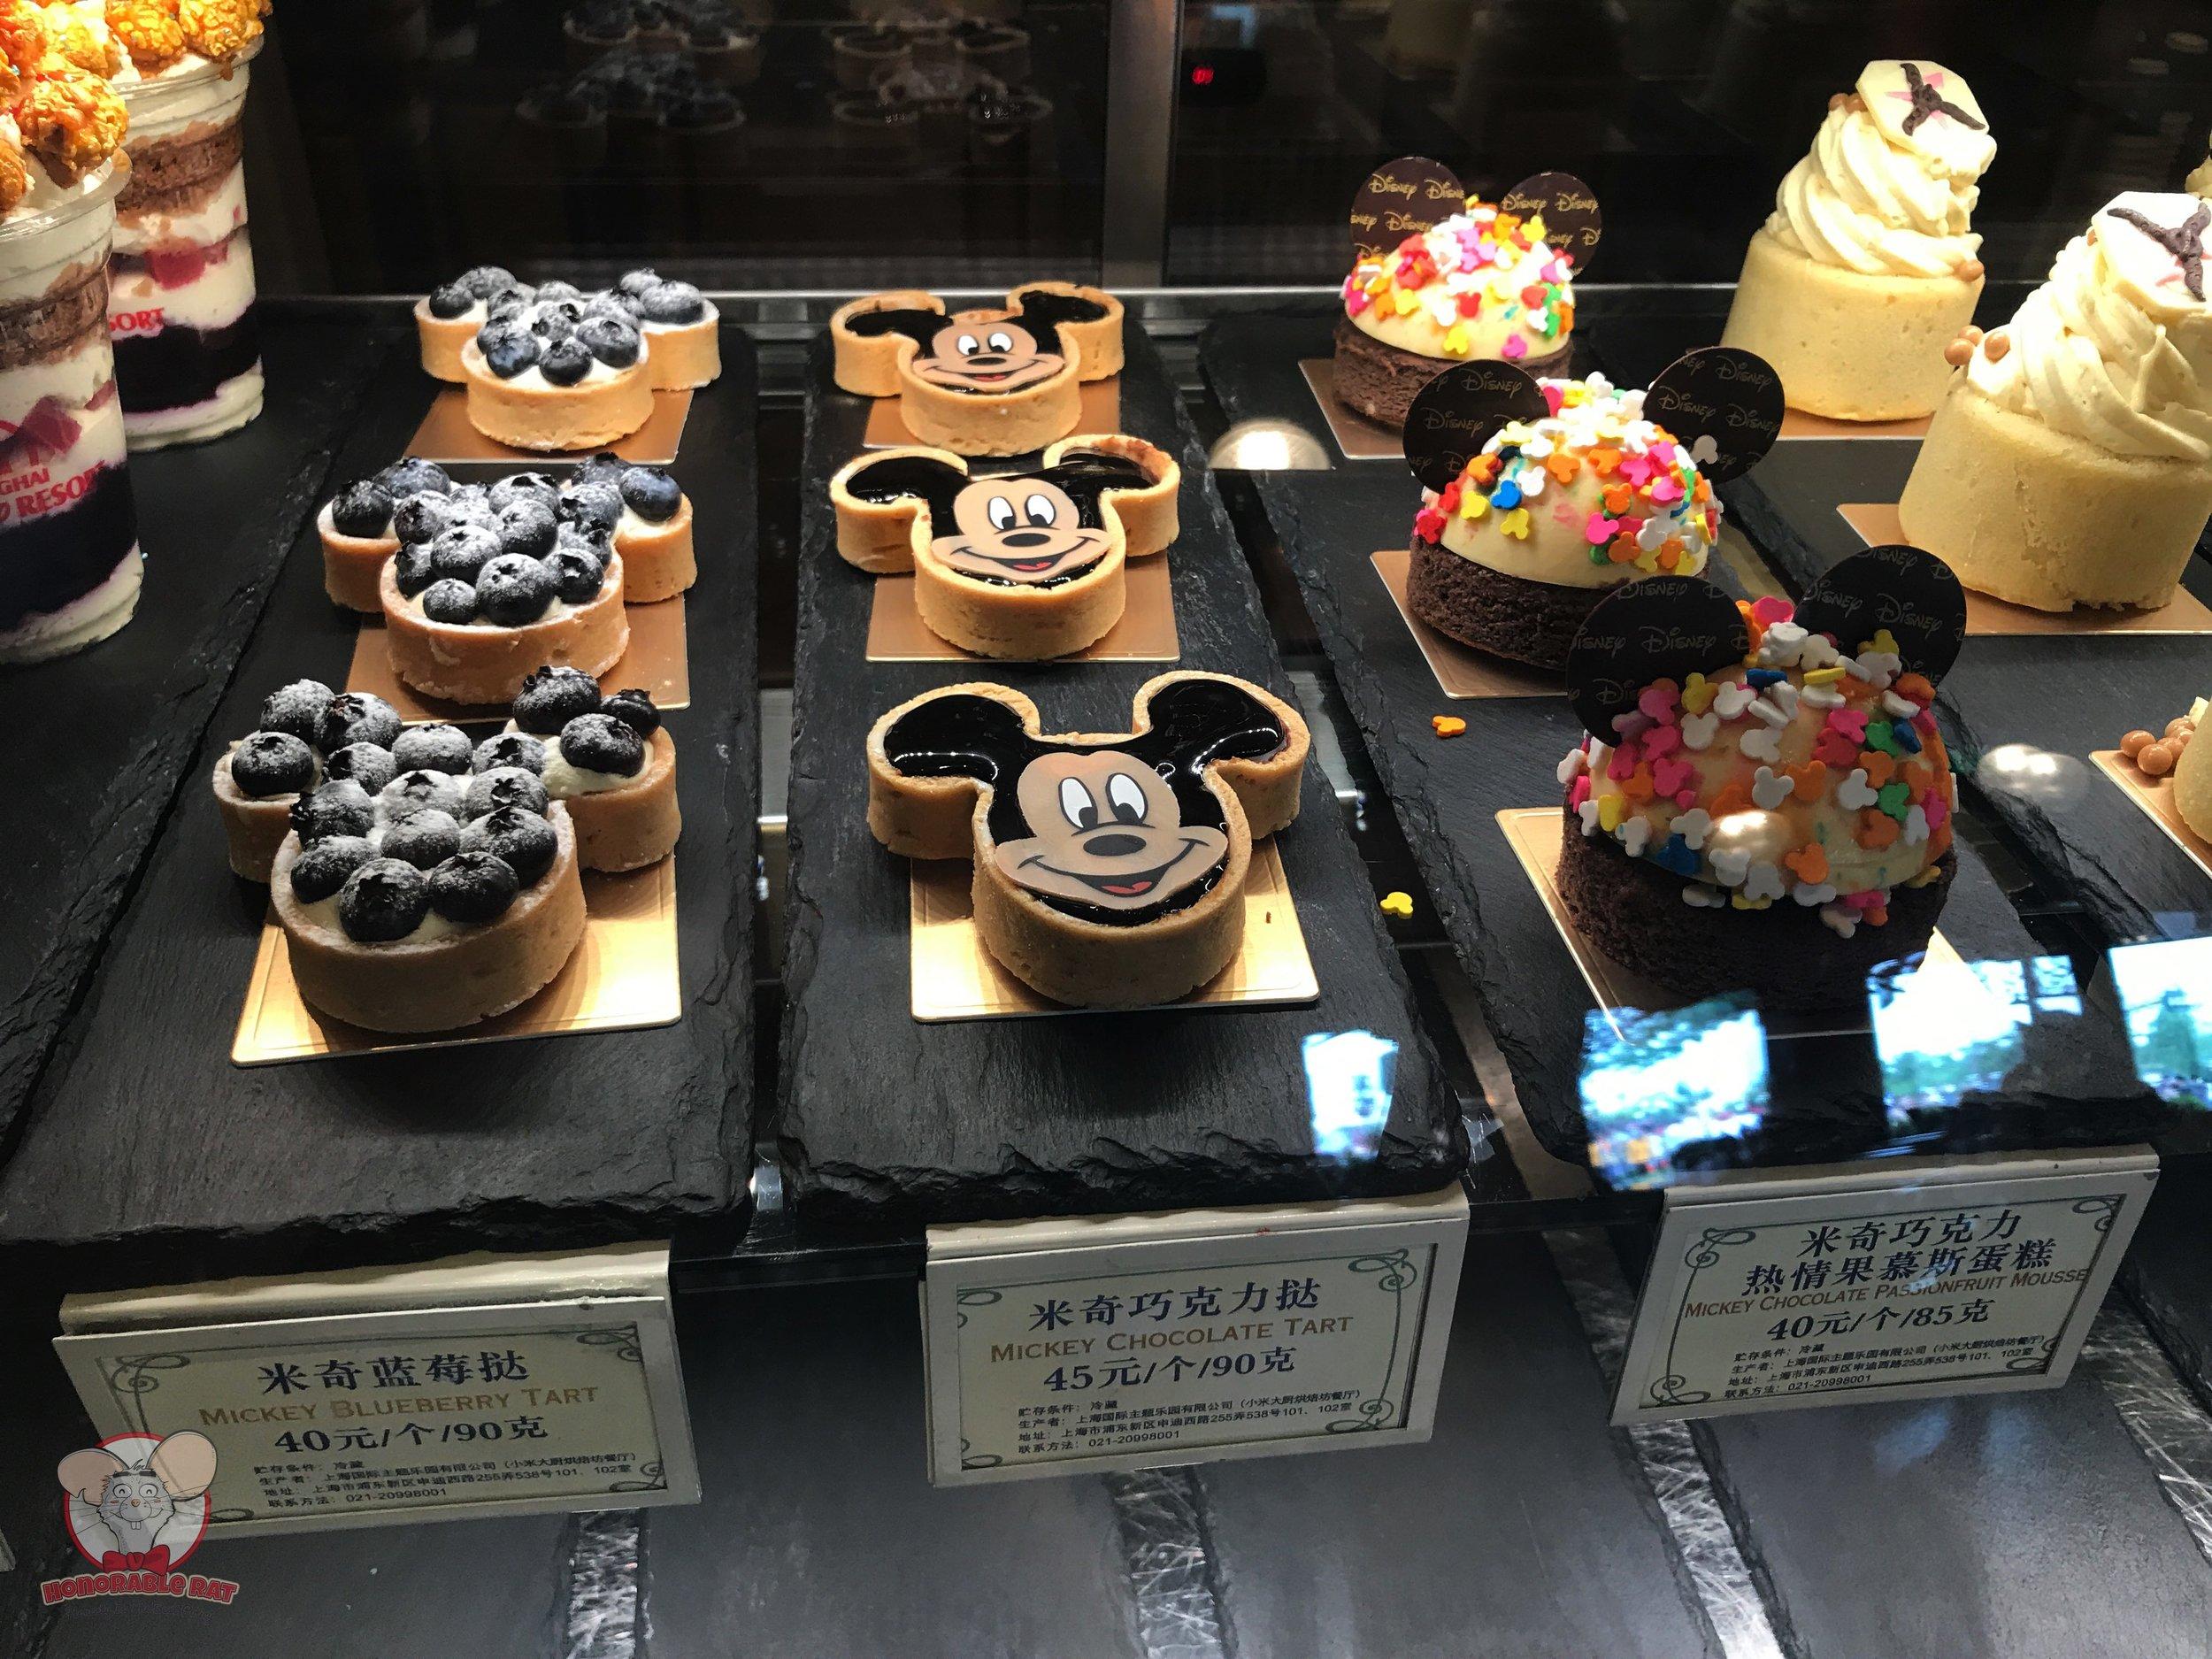 Mickey pastries!